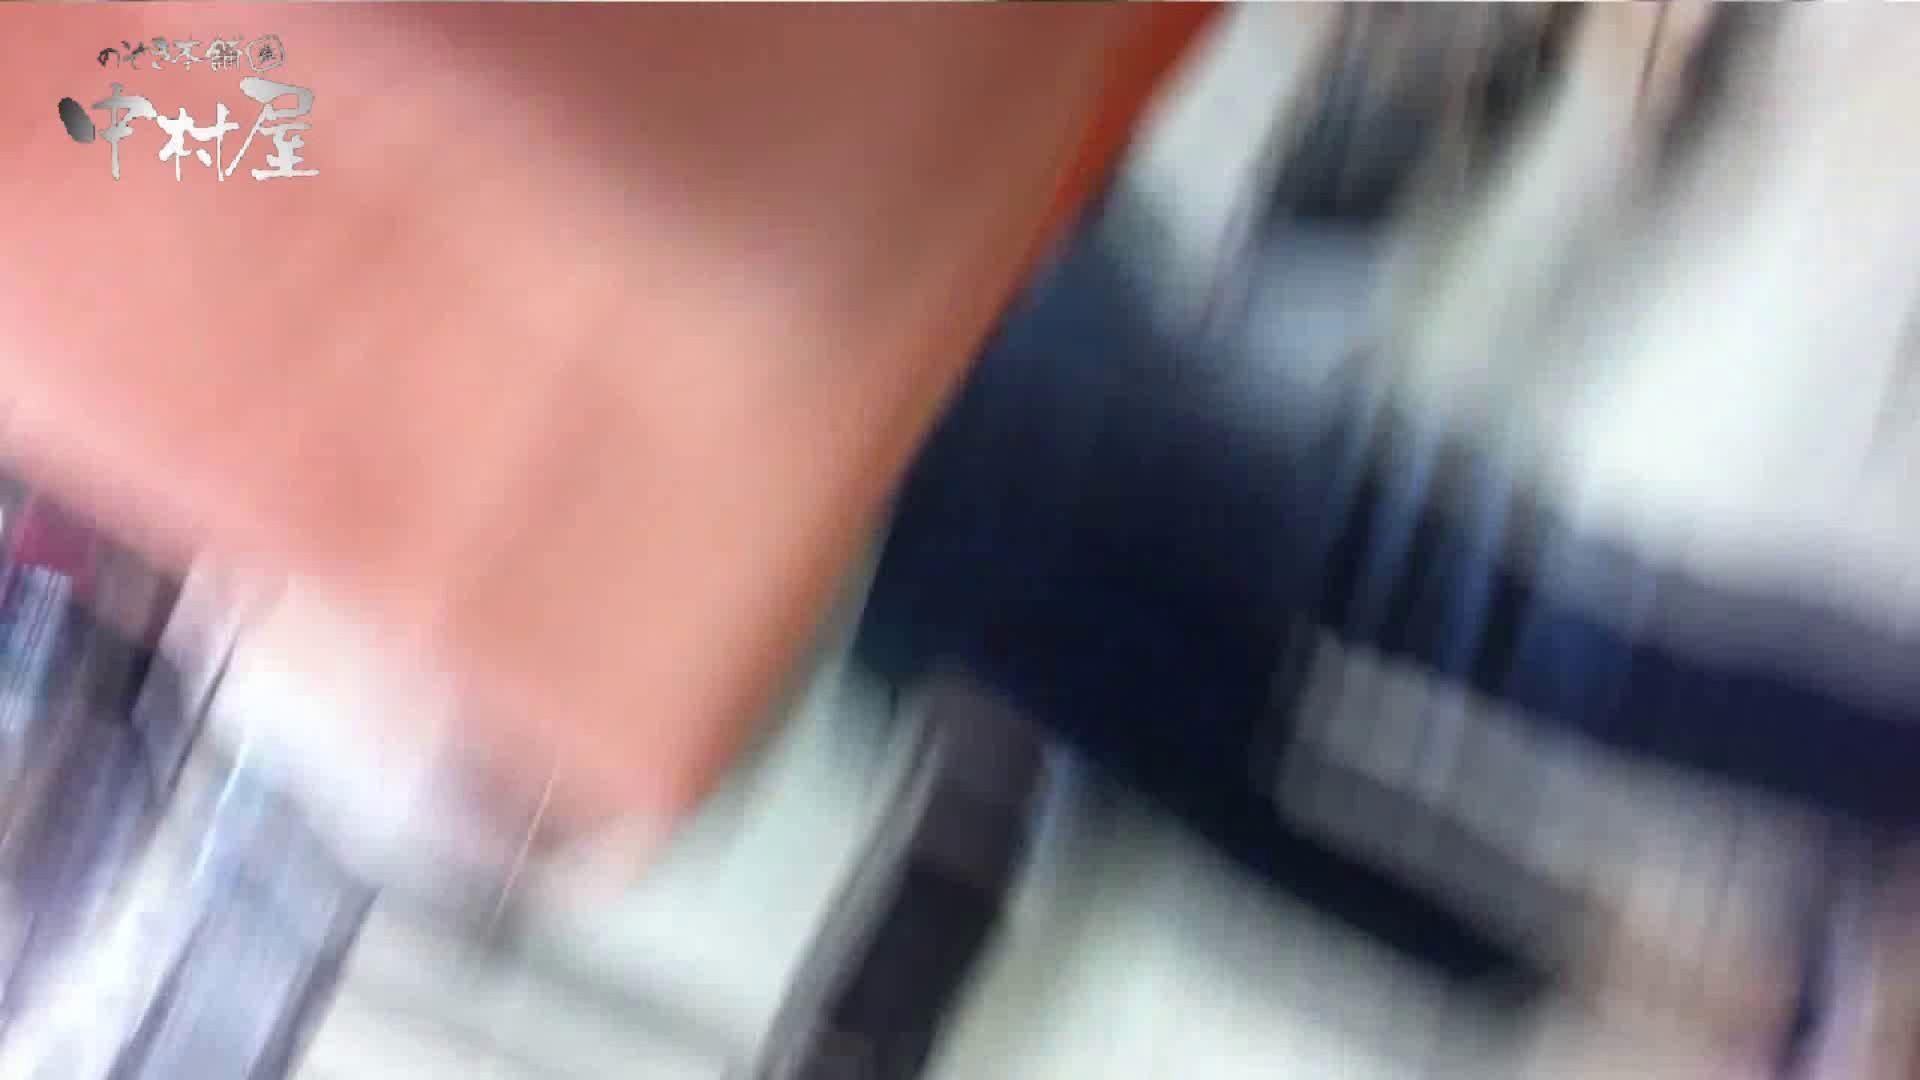 vol.44 可愛いカリスマ店員限定‼胸チラ&パンチラ はみパンねぇさん! 接写 AV無料動画キャプチャ 33連発 12